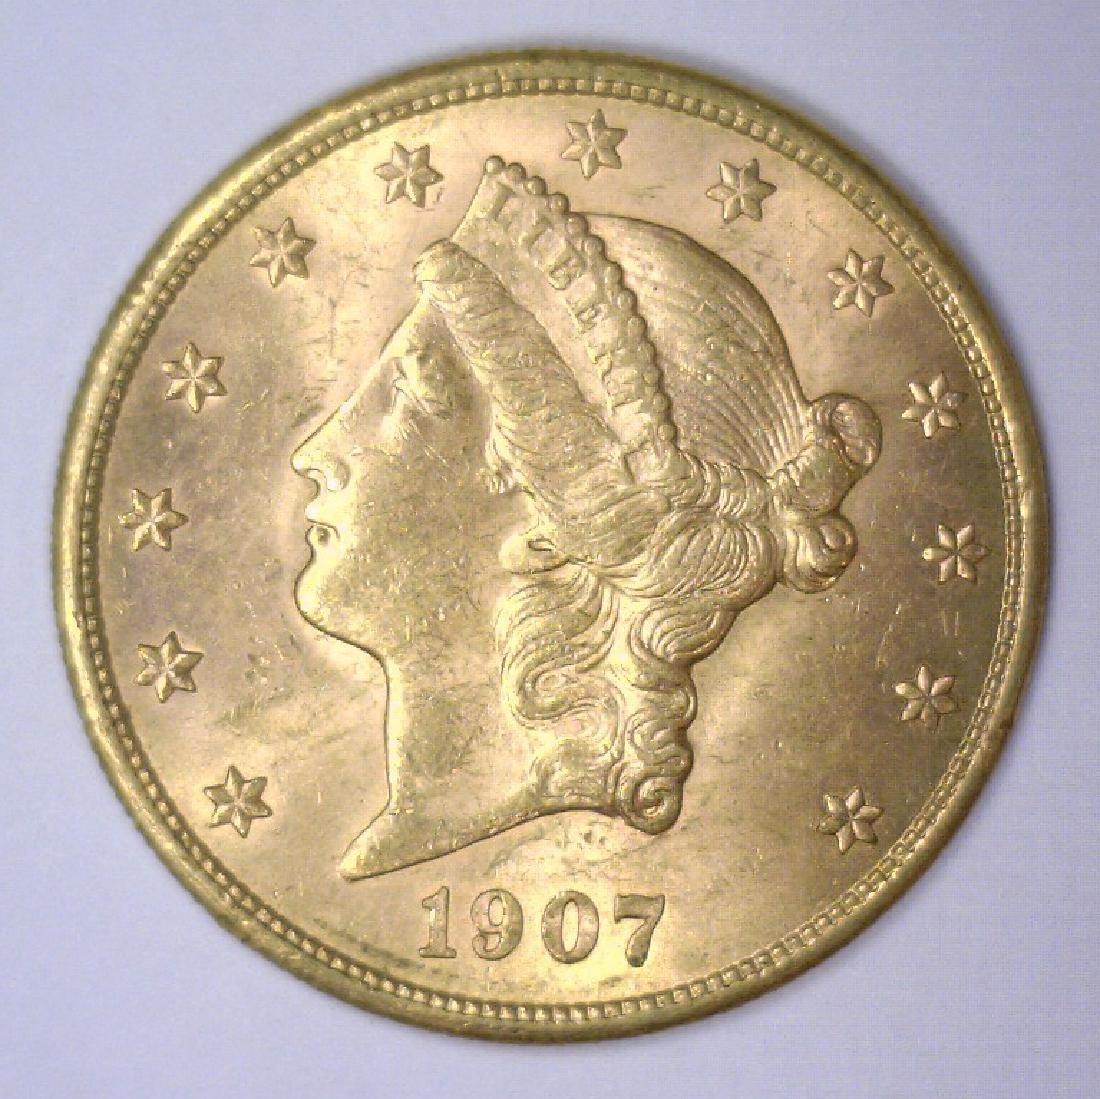 01907-S $20 Liberty Gold Double Eagle BU